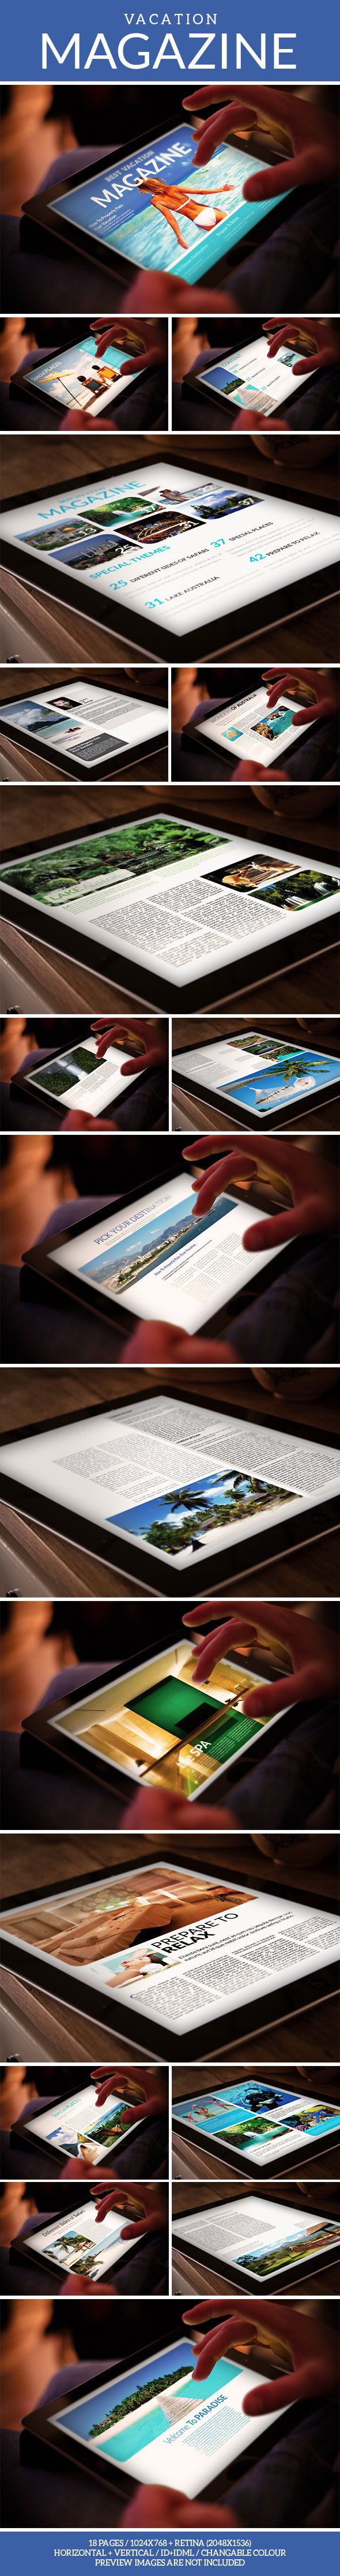 Tablet Vacation Magazine Template by Milos Djurovic, via Behance